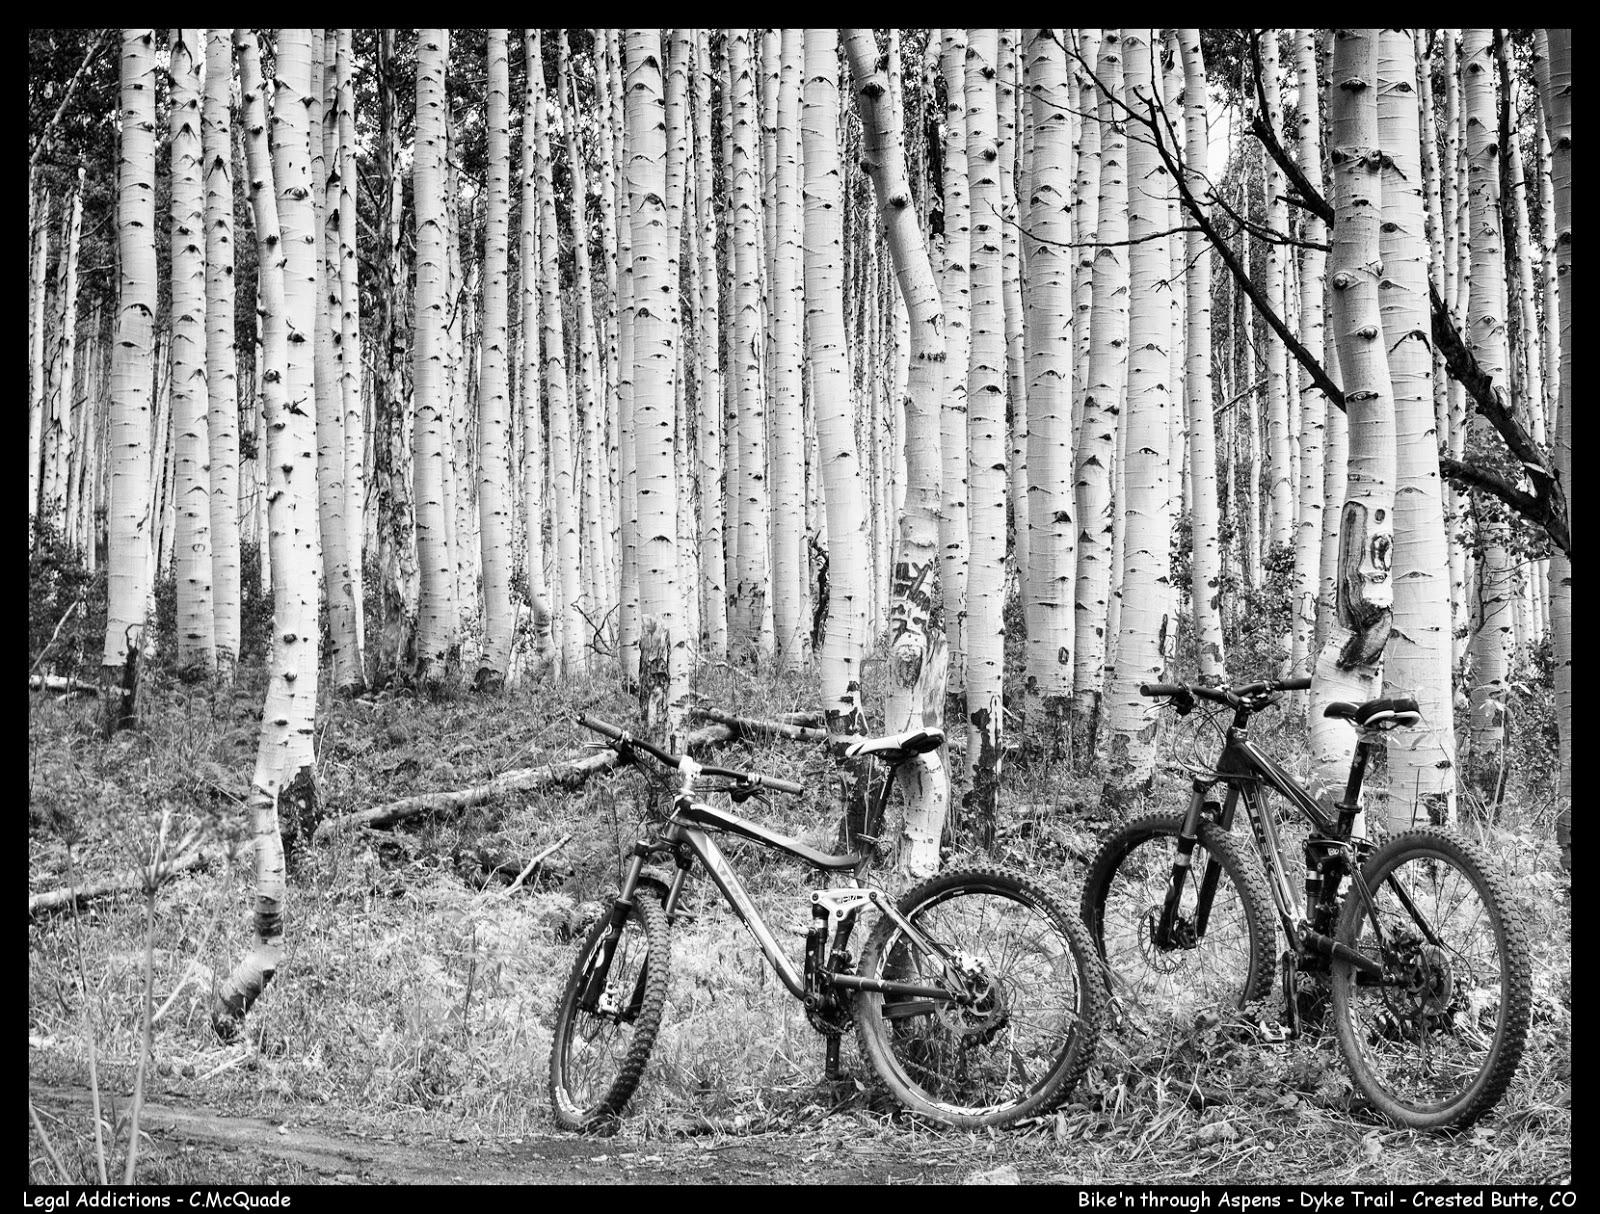 bikes%2Band%2Baspens-.jpg